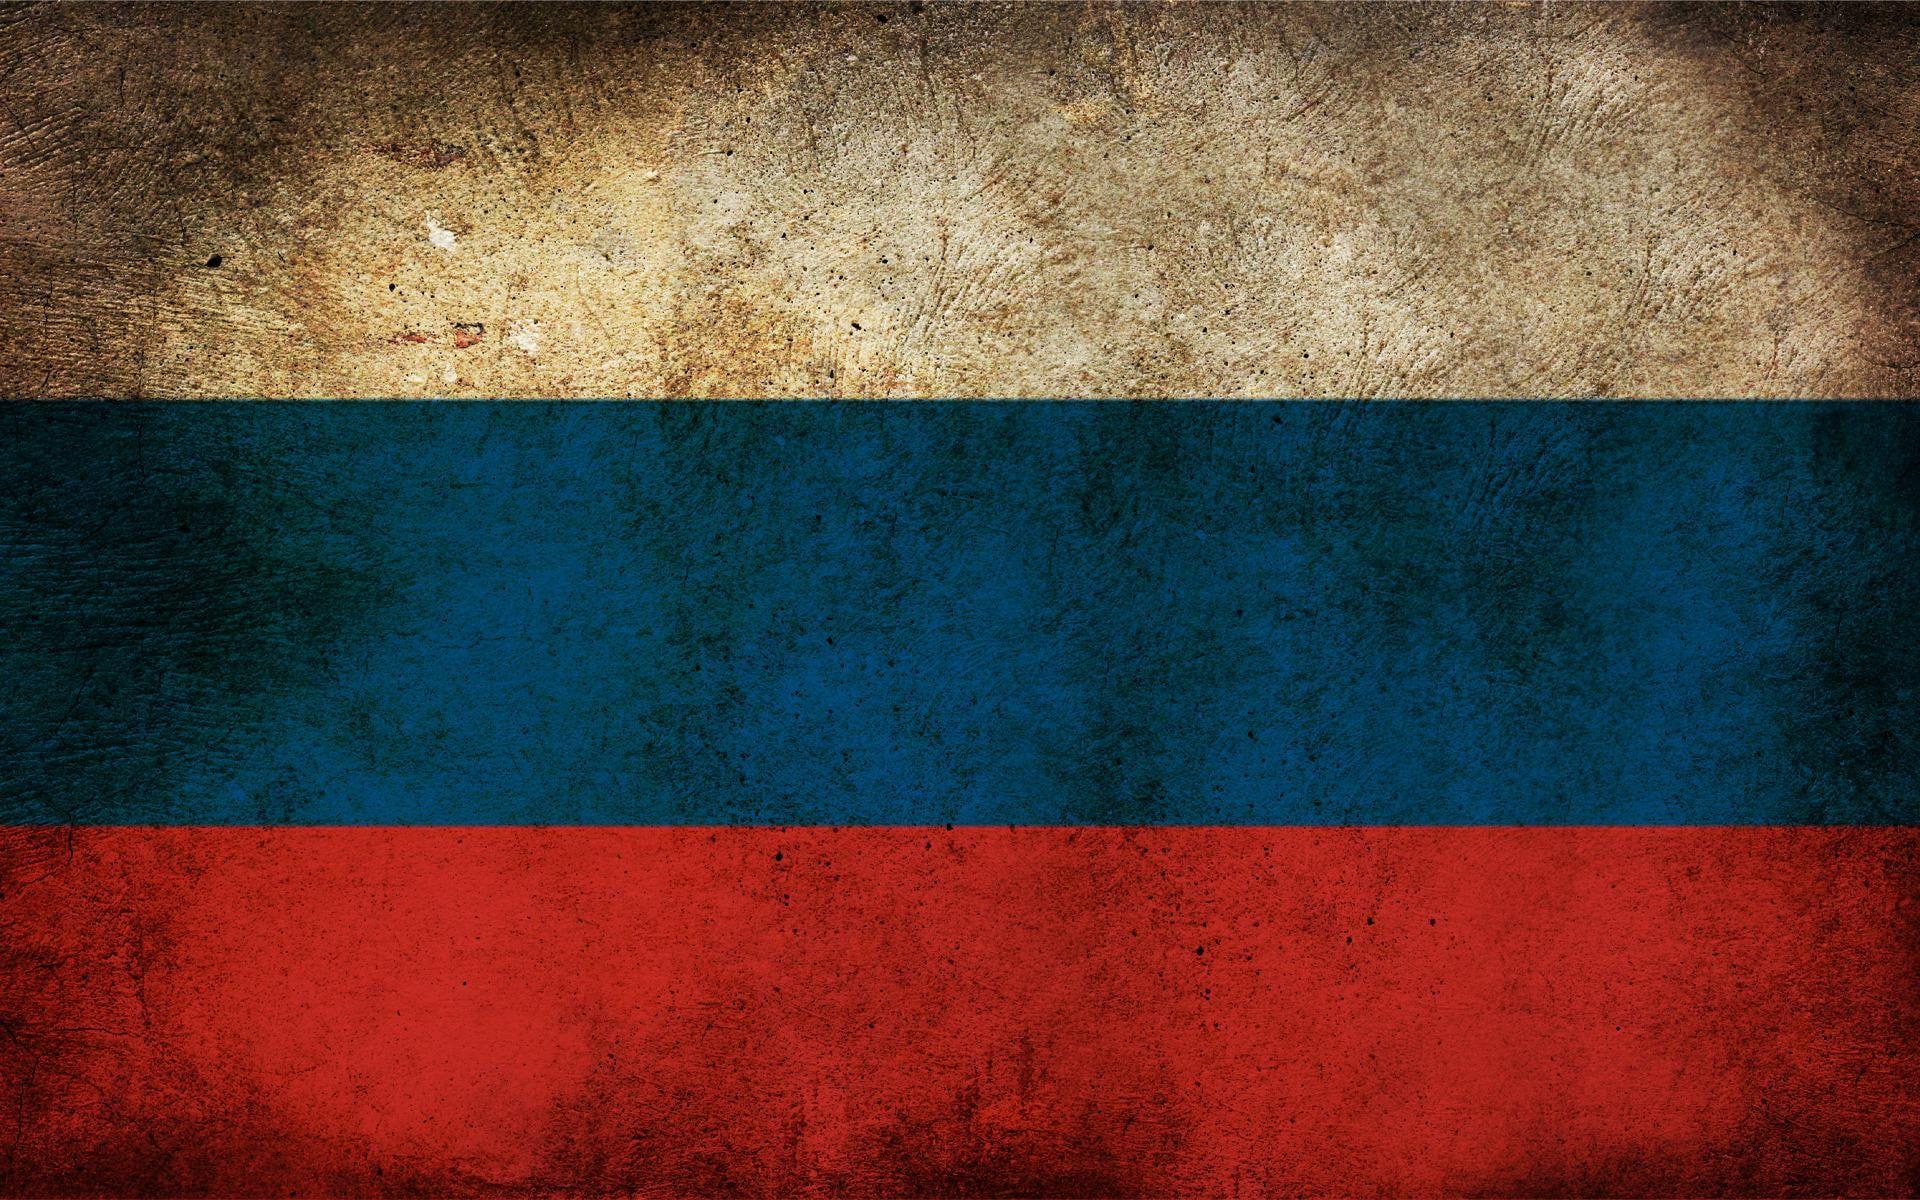 Russian Flag Digital Art 1920x1200 Flag Russia 1080p Wallpaper Hdwallpaper Desktop Russian Flag Russia Flag Flag